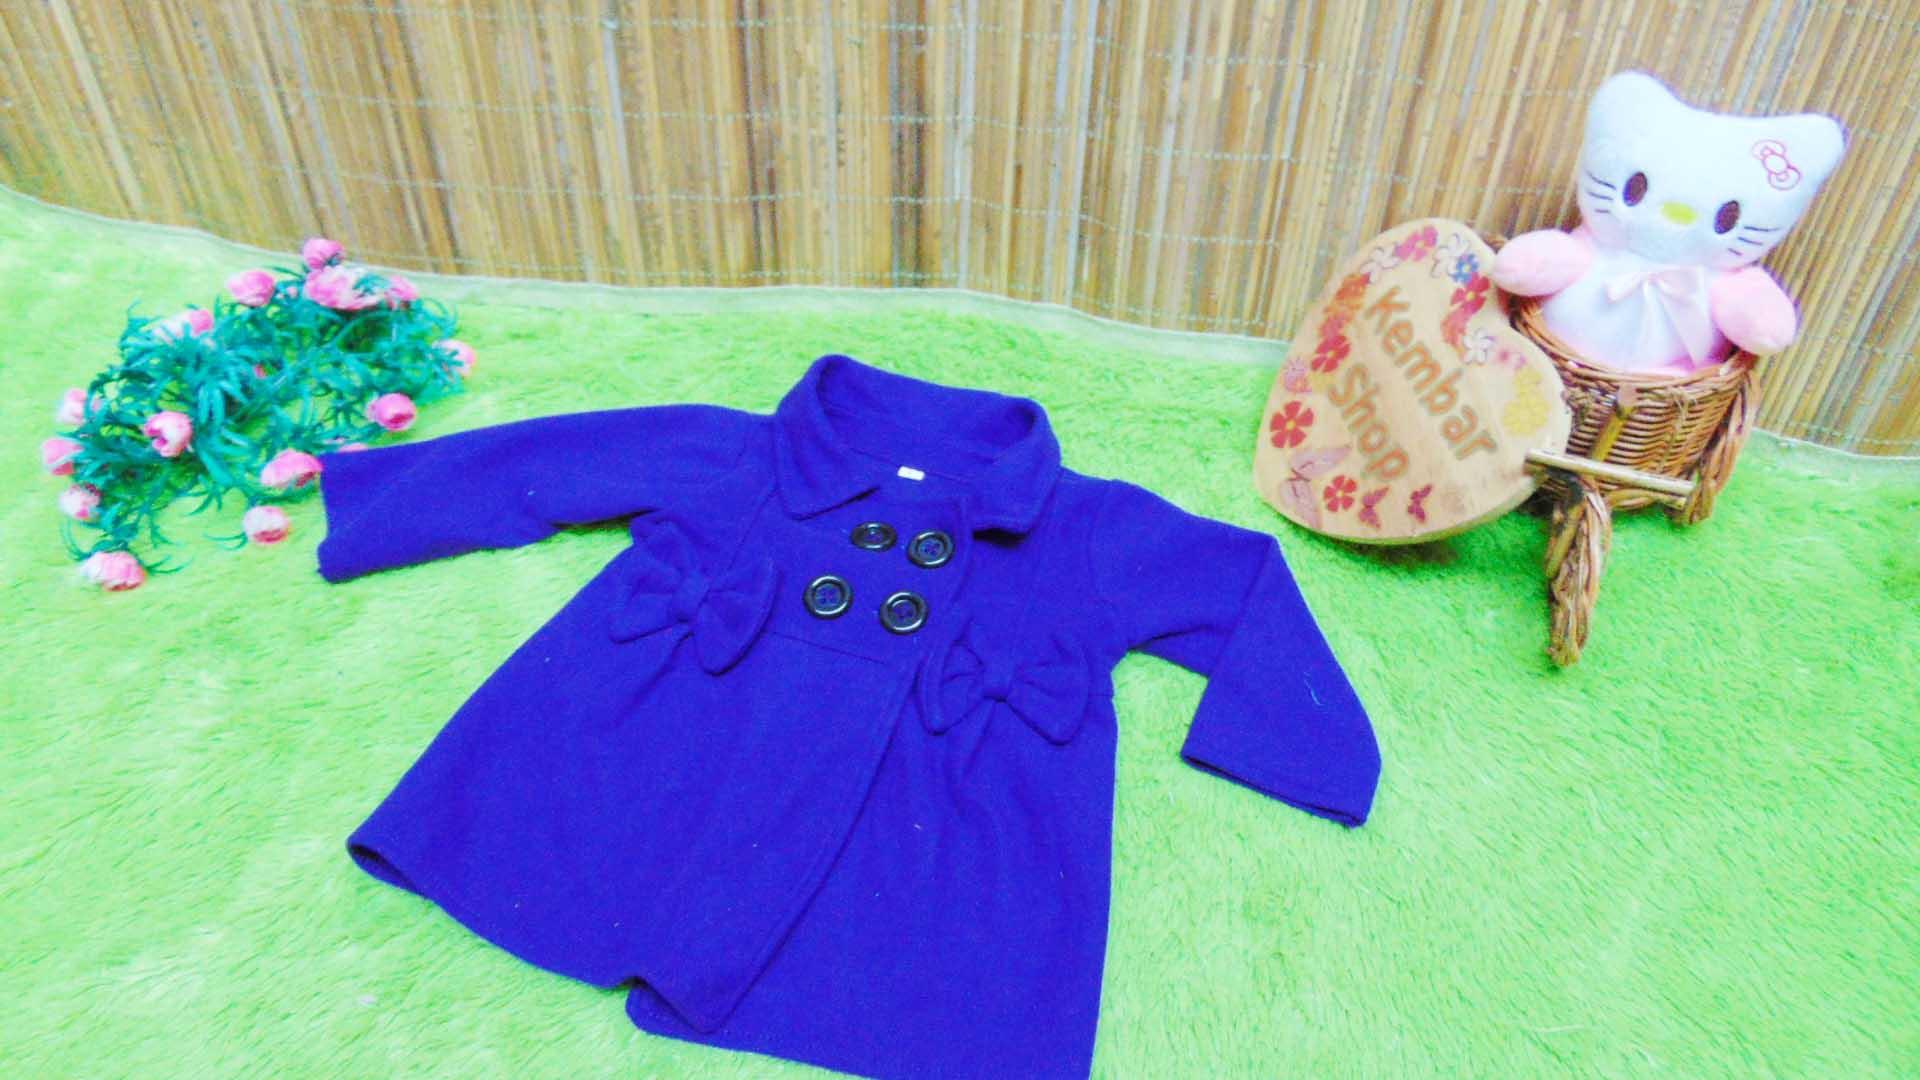 jaket bayi blazer baby mantel bayi hangat lembut 0-18bulan polos ungu (2)